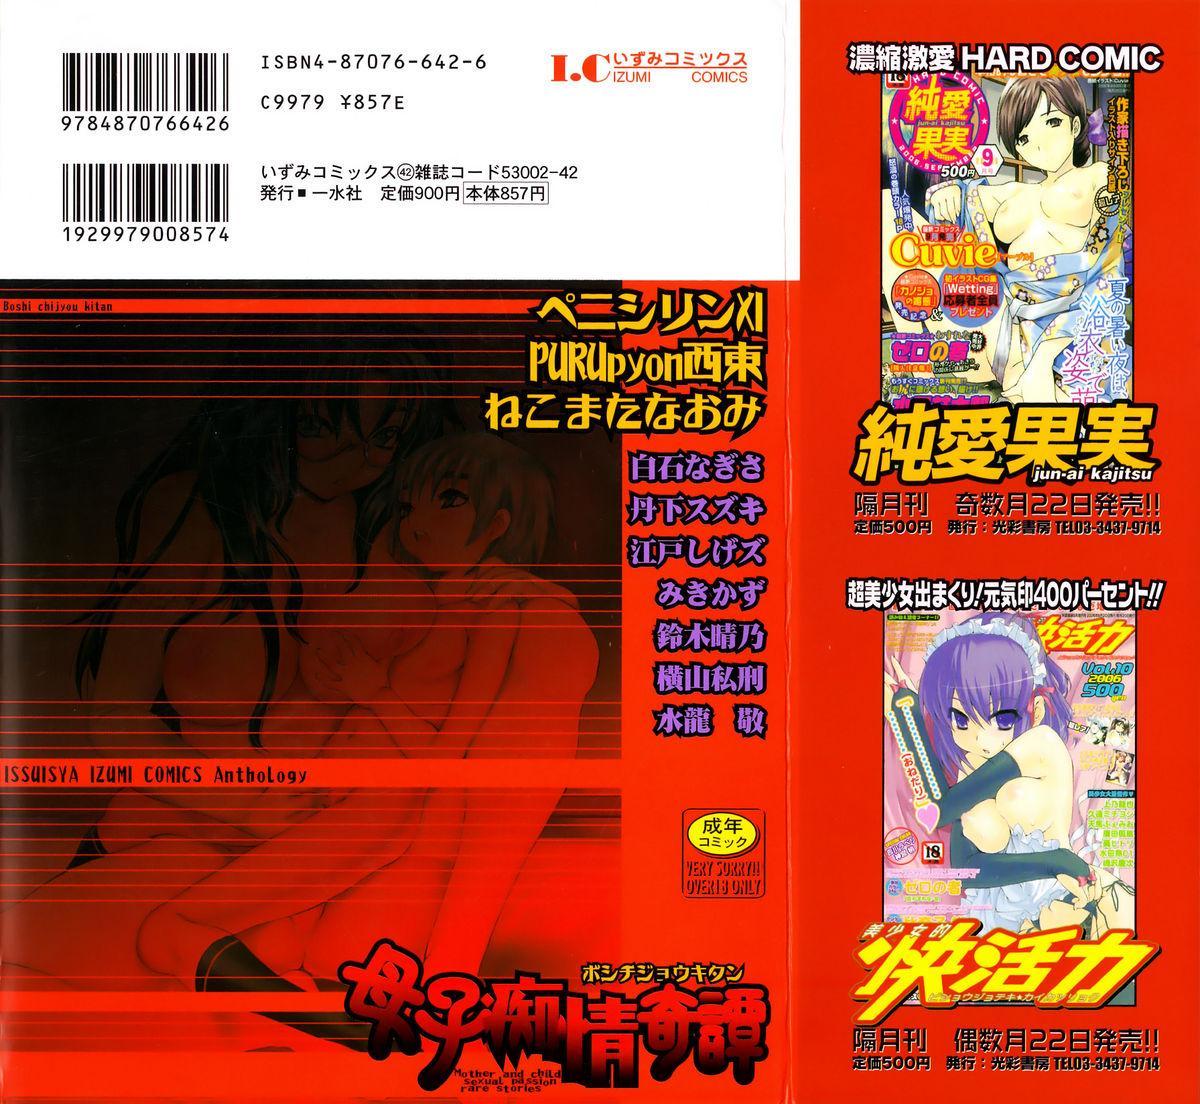 Boshi Chijou Kitan 1